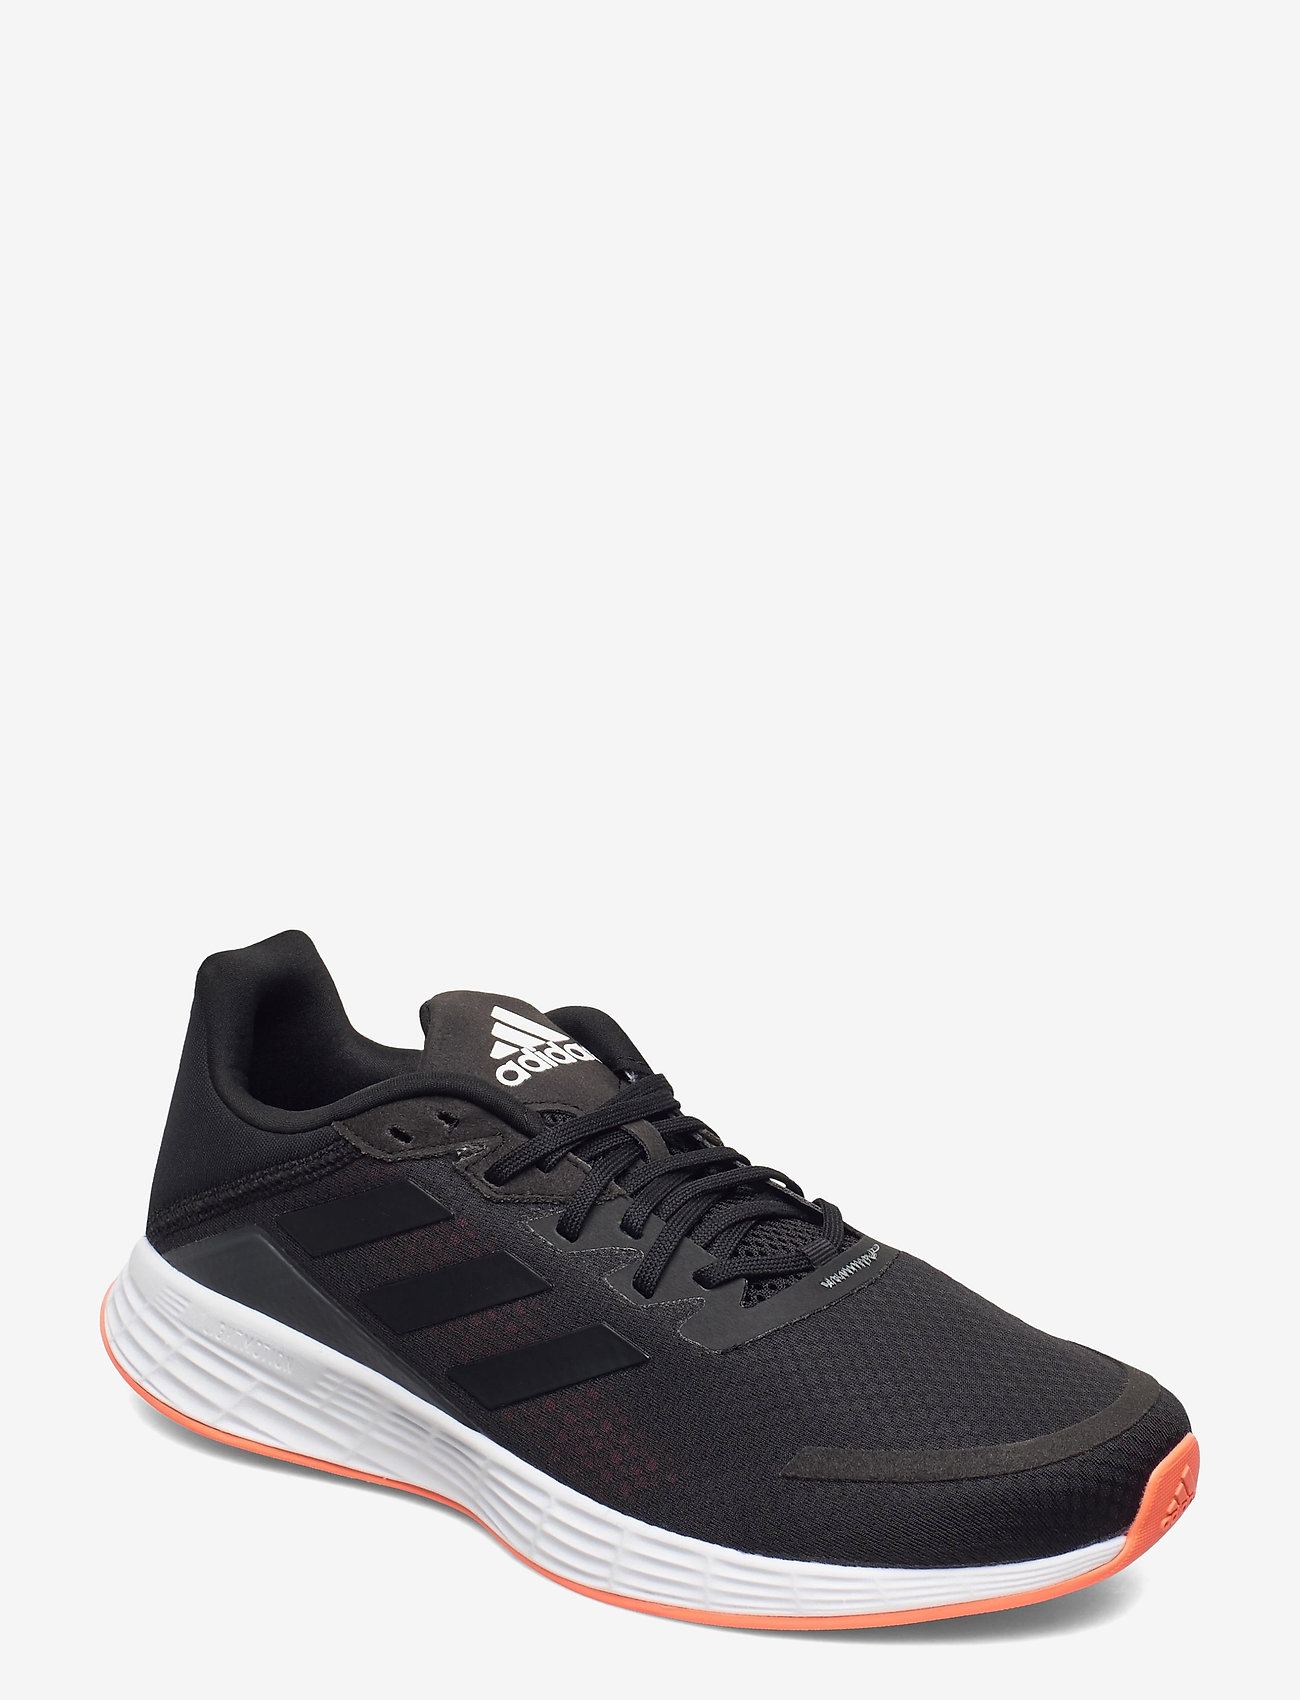 adidas Performance - Duramo SL - löbesko - cblack/cblack/gresix - 0